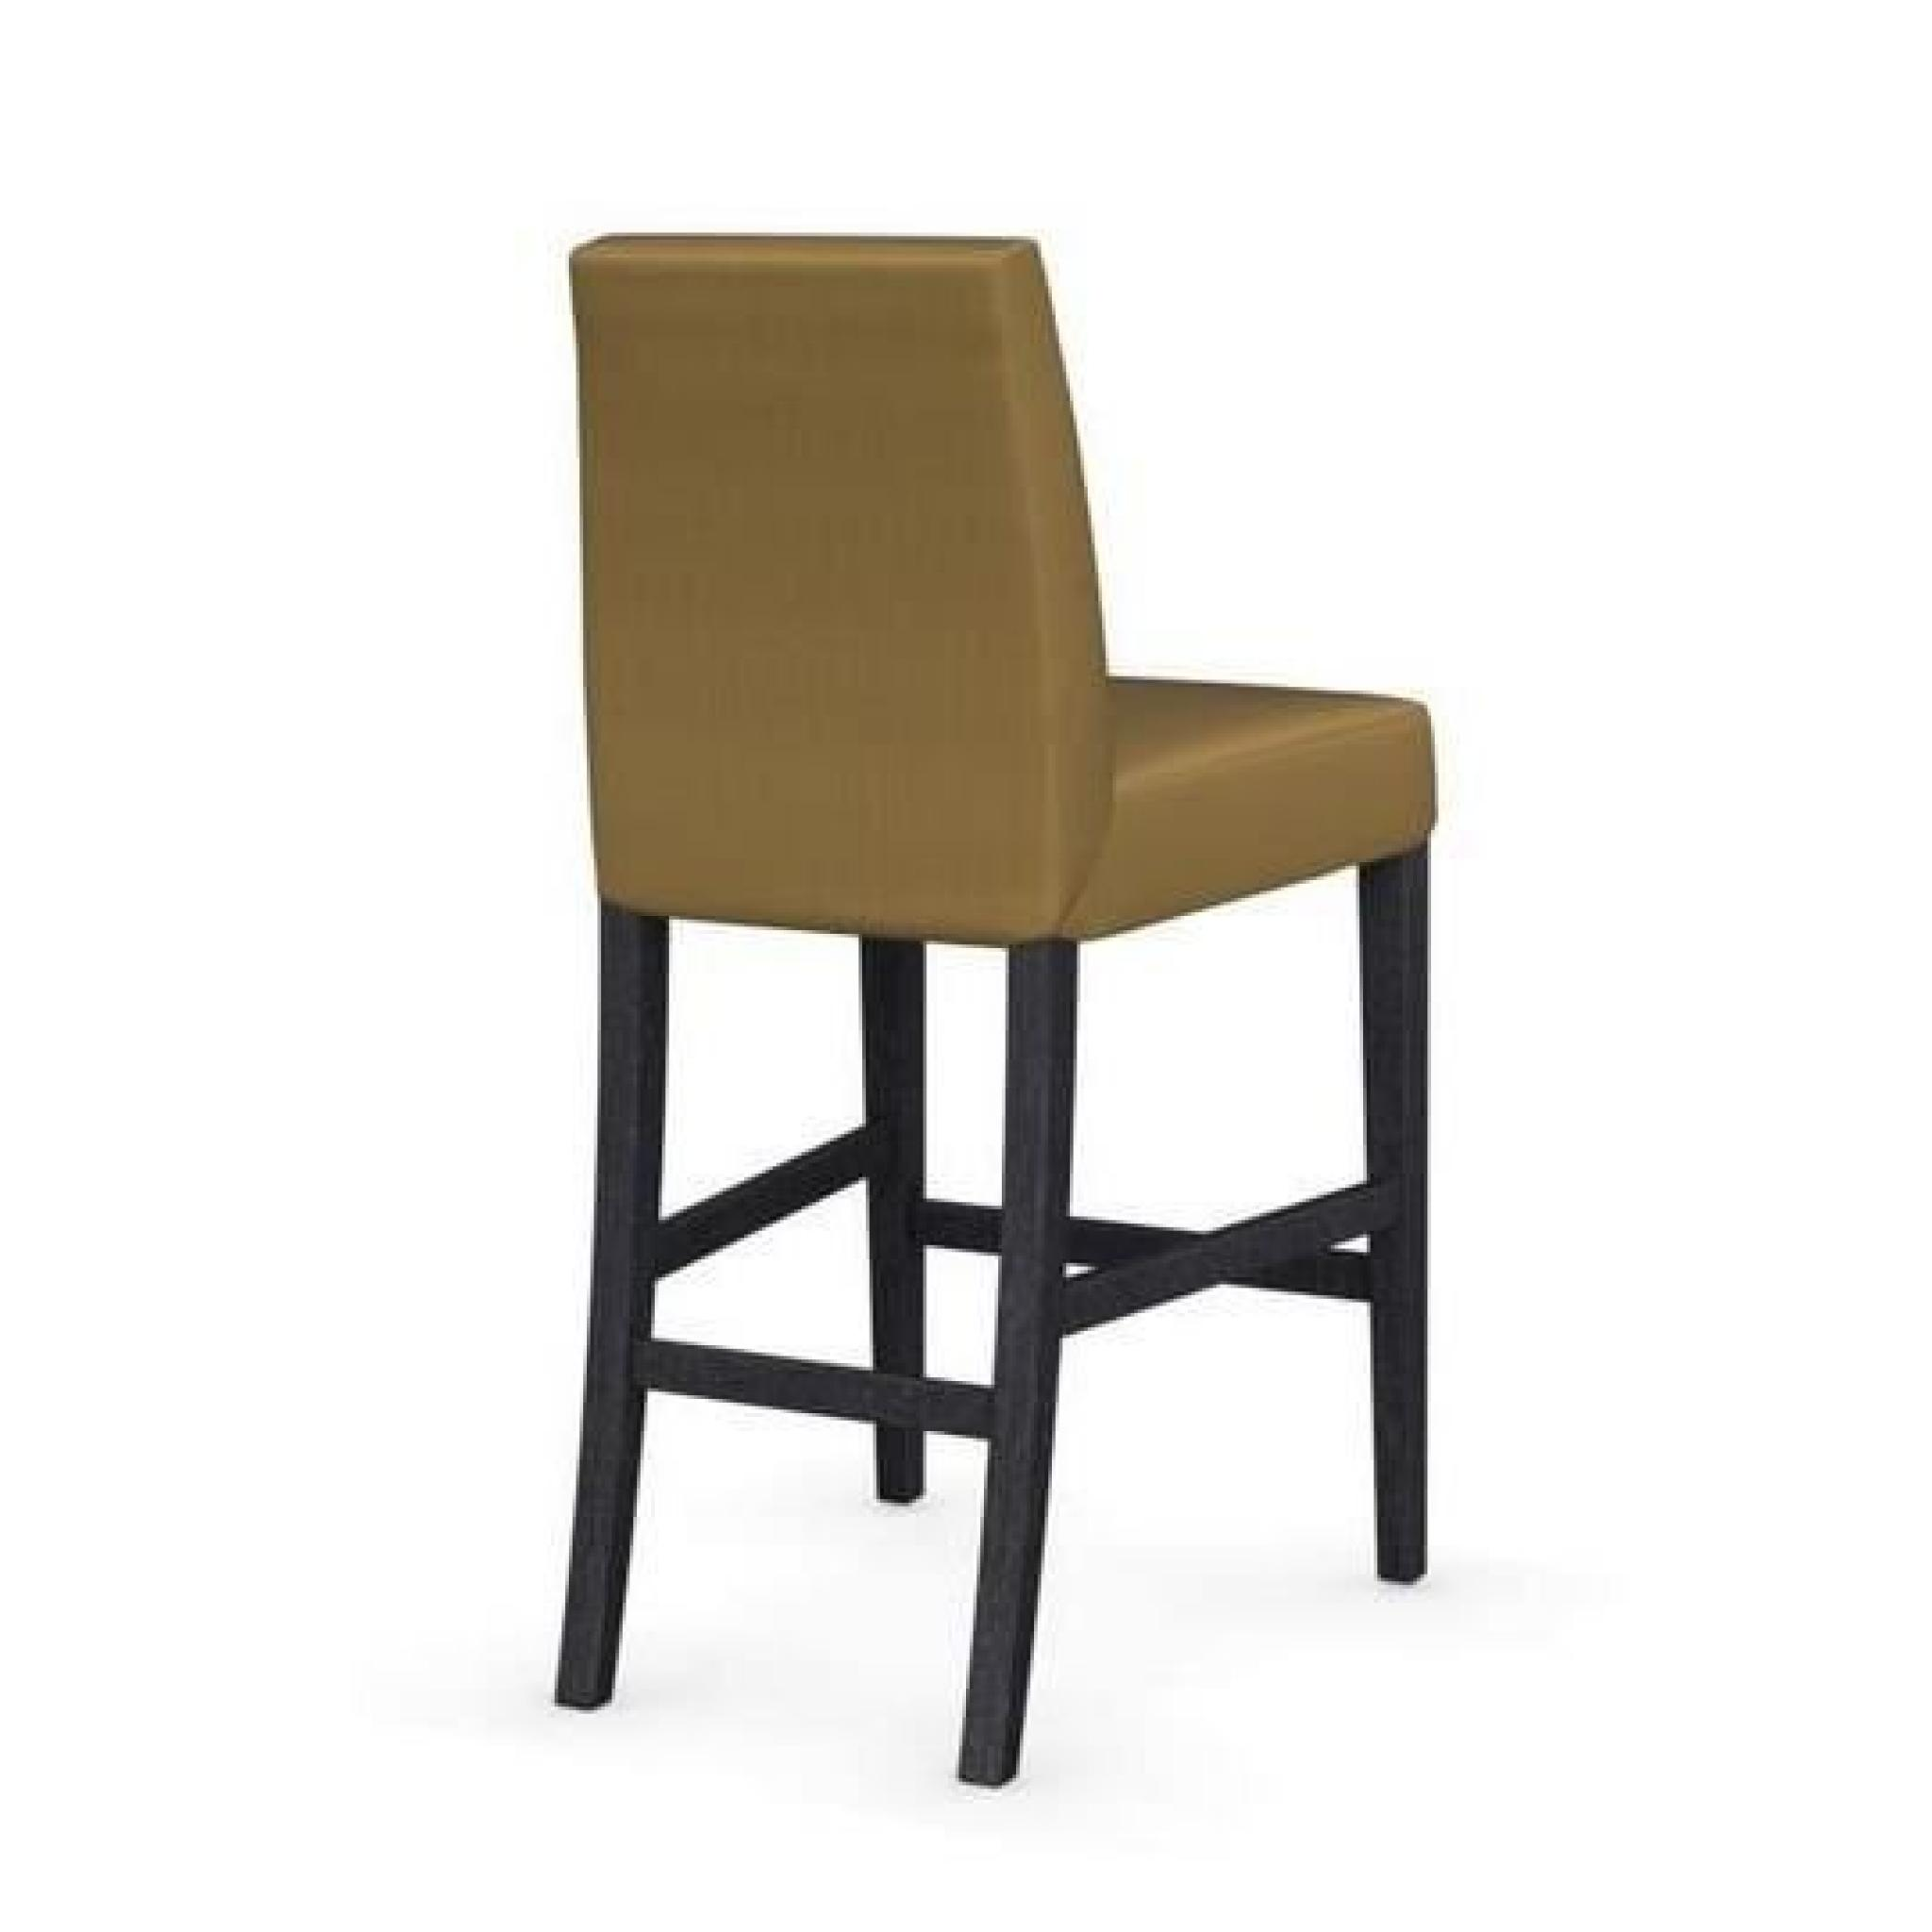 Chaise de bar latina de calligaris jaune moutar achat - Chaise de bar design pas cher ...